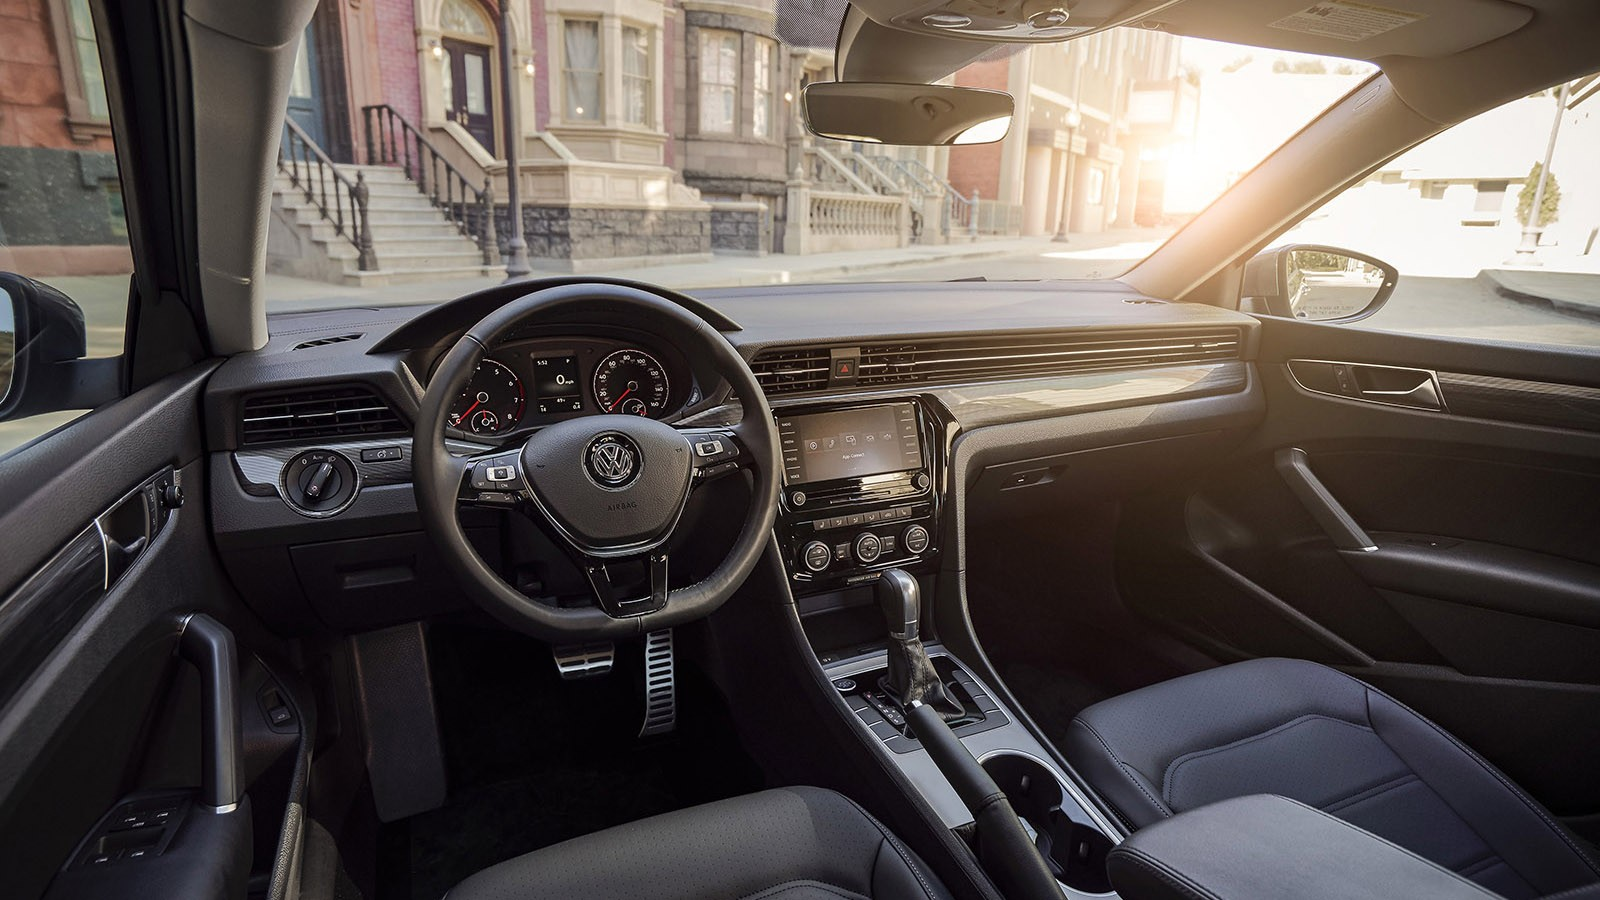 Volkswagen Passat 2020 model'nogo goda - obzor, inter'er, cena v rossii